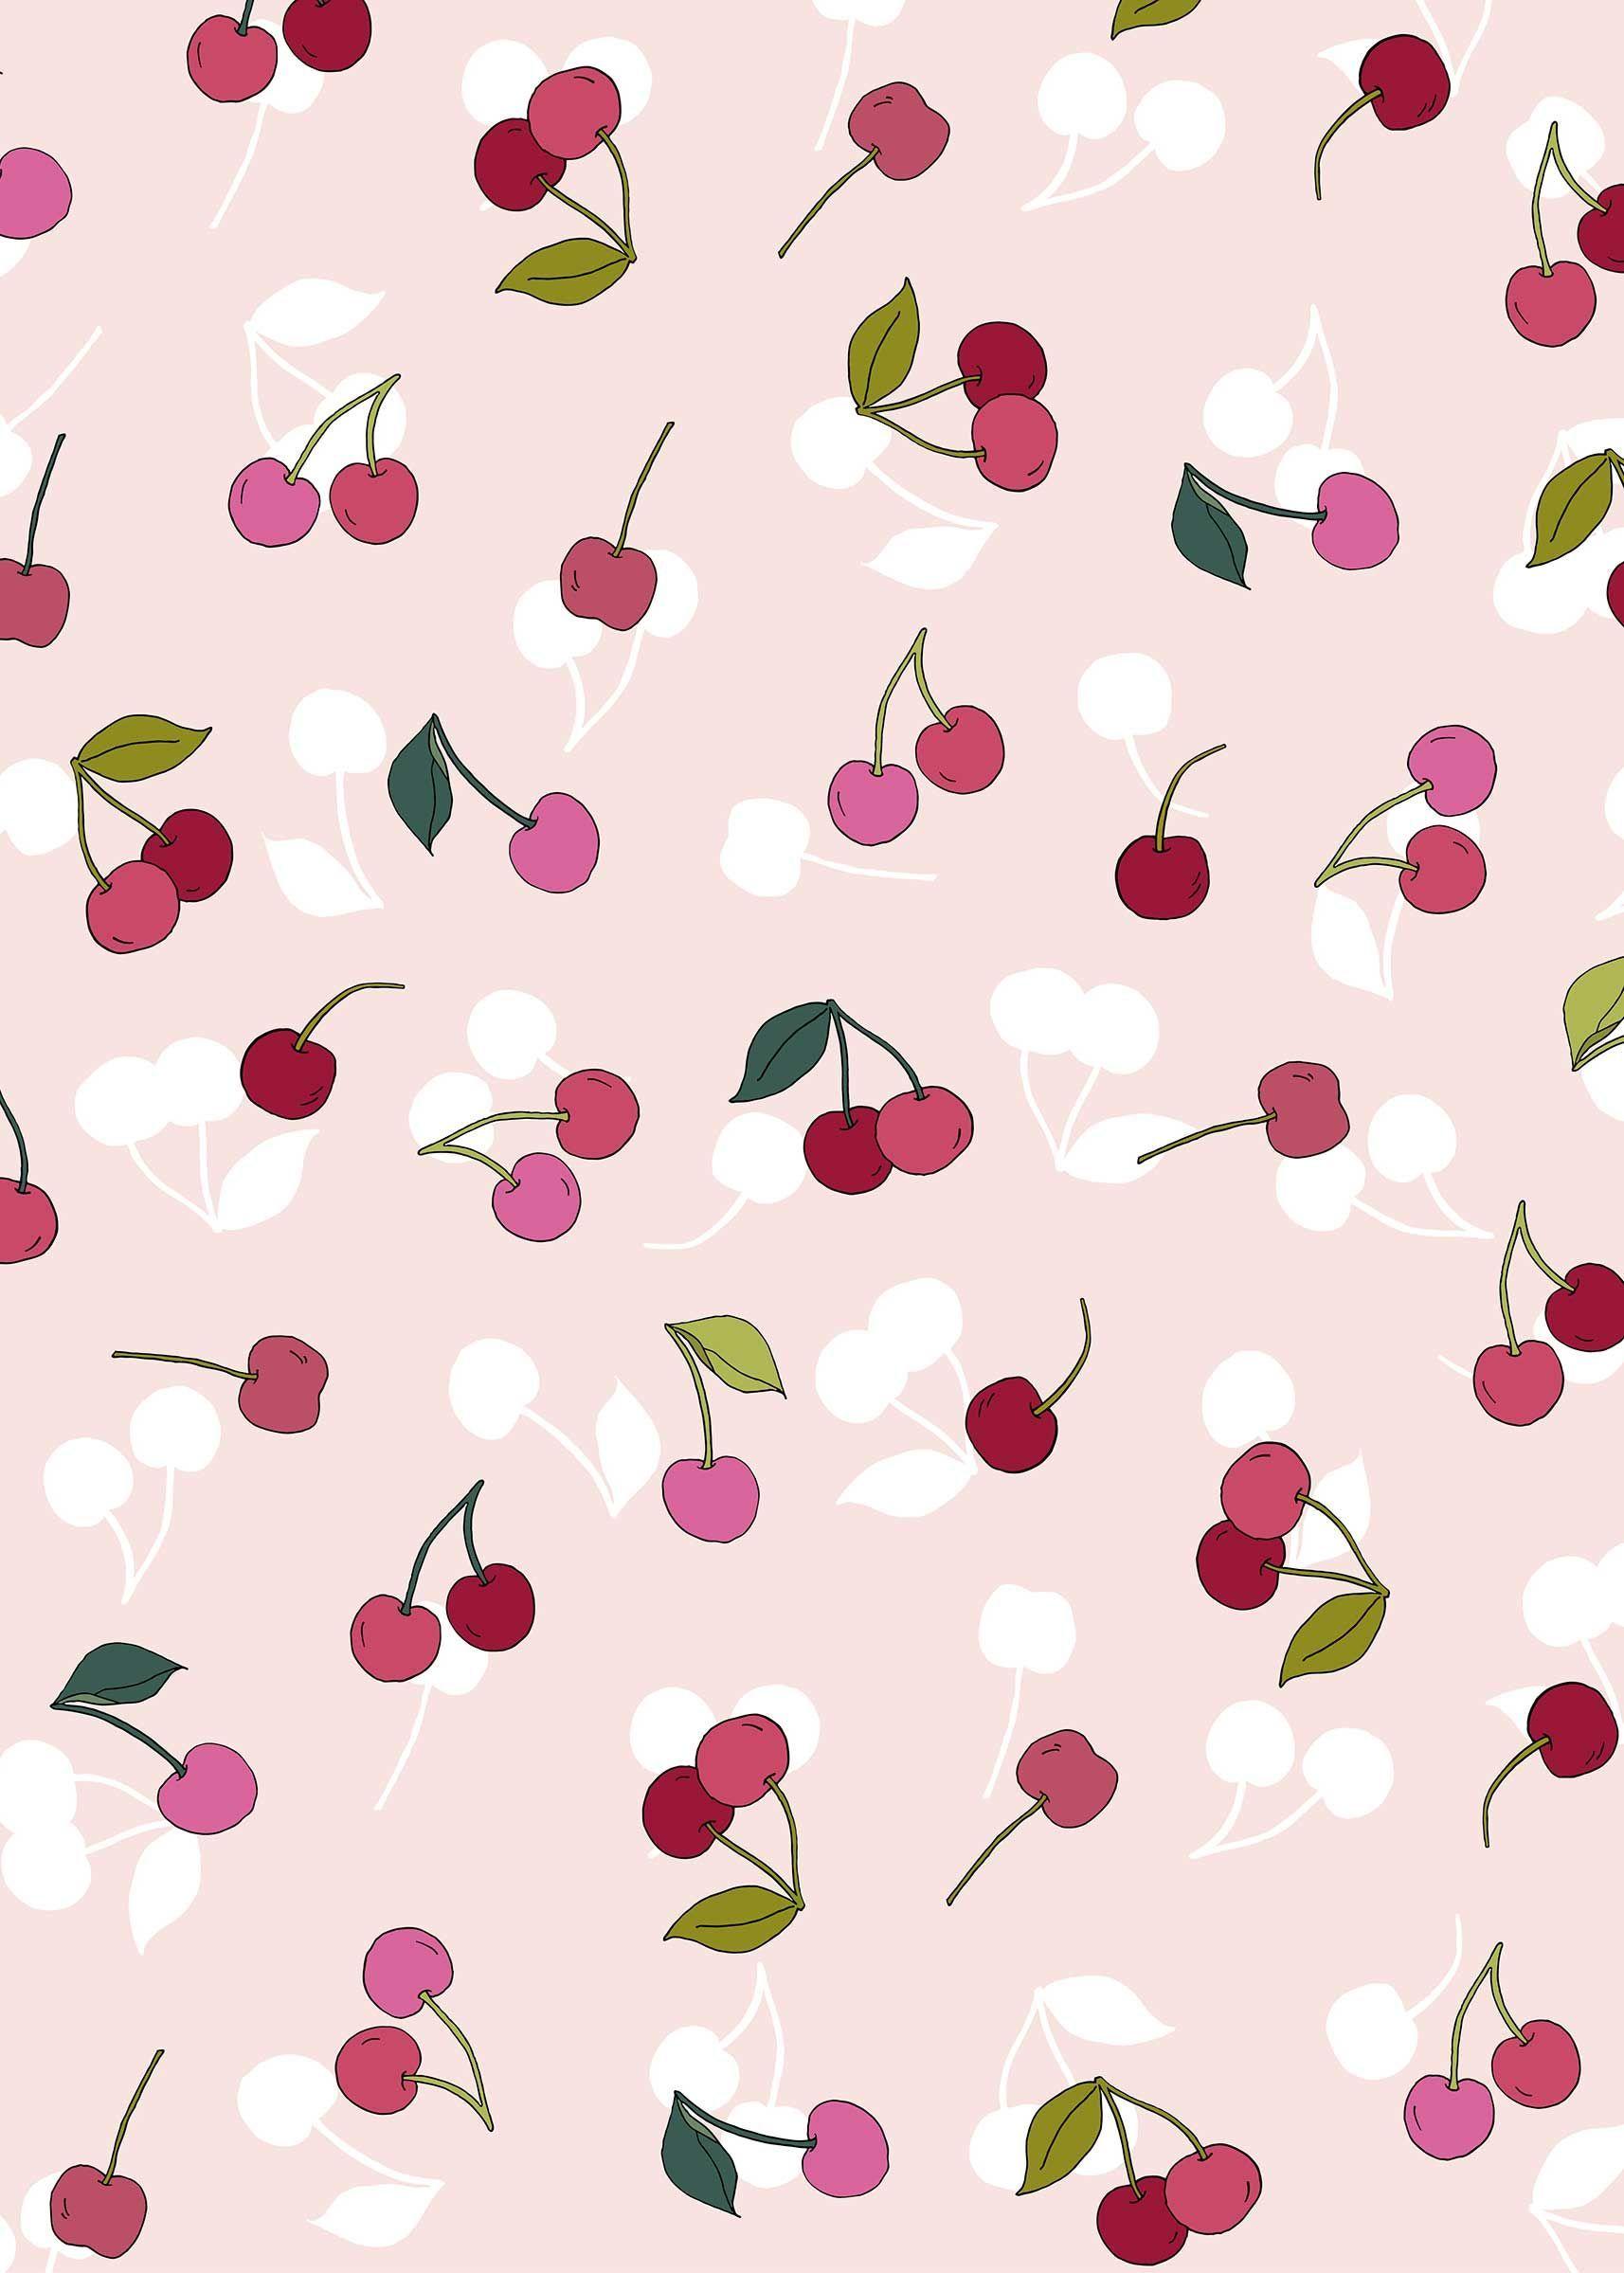 Cherry Desktop Wallpaper Free Download For Desktop Ipad And Iphone Cute Wallpapers For Ipad Ipad Pro Wallpaper Fruit Wallpaper